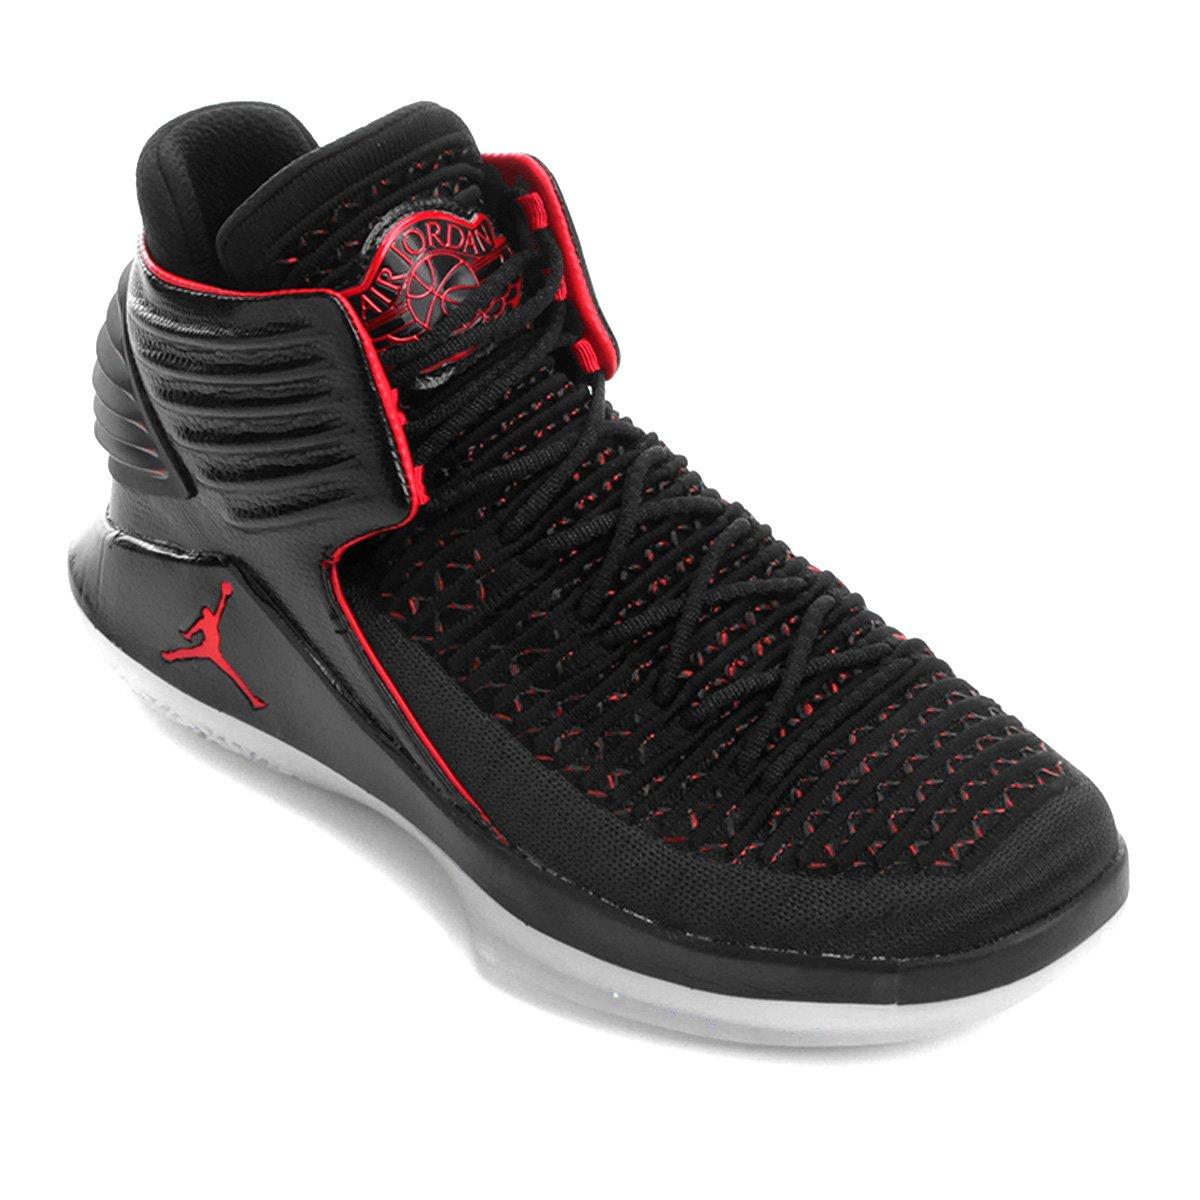 8233b75699d ... Tênis Nike Air Jordan XXXII Masculino - Compre Agora Loja ...